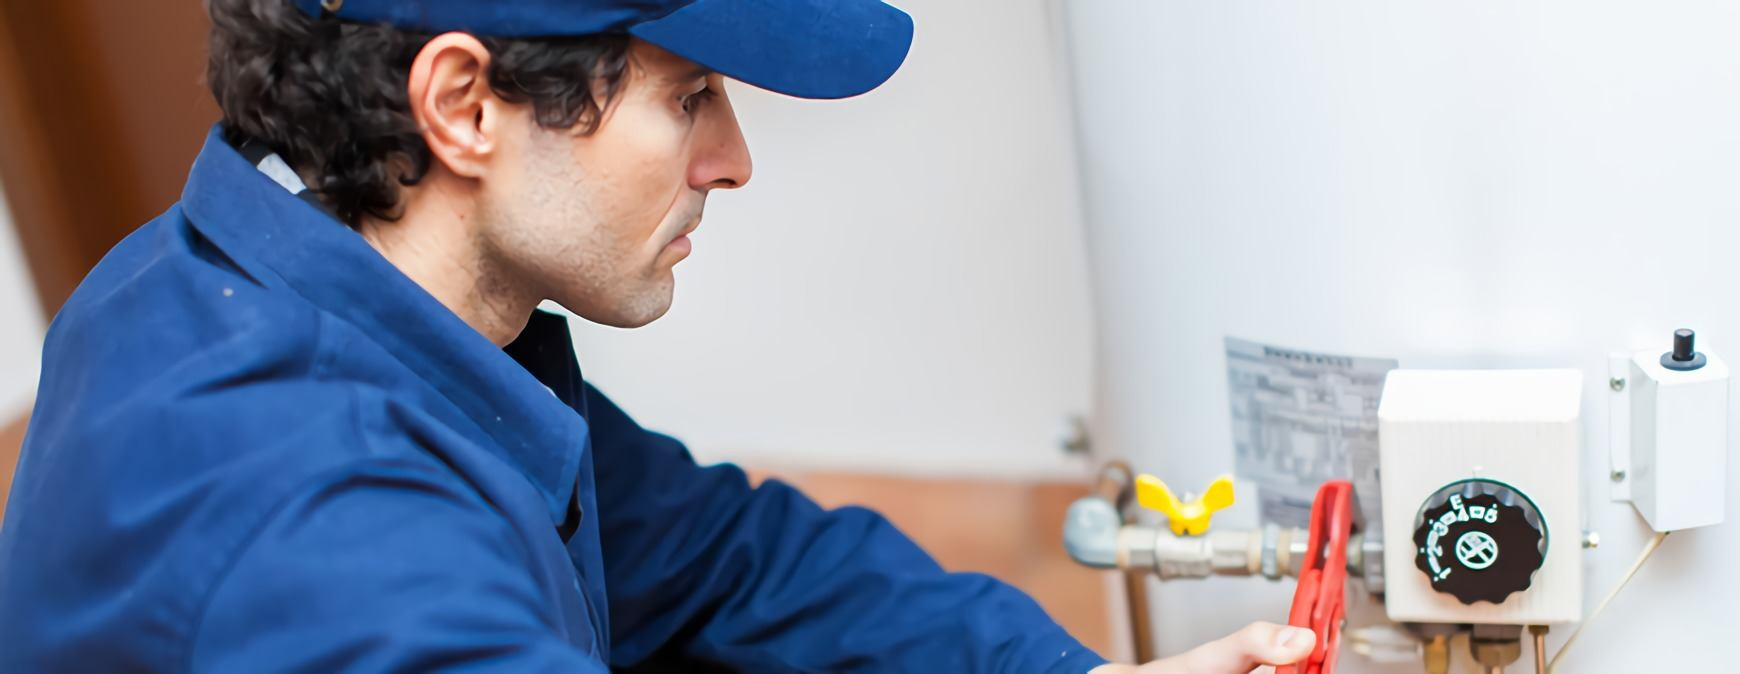 hvac vs plumbing